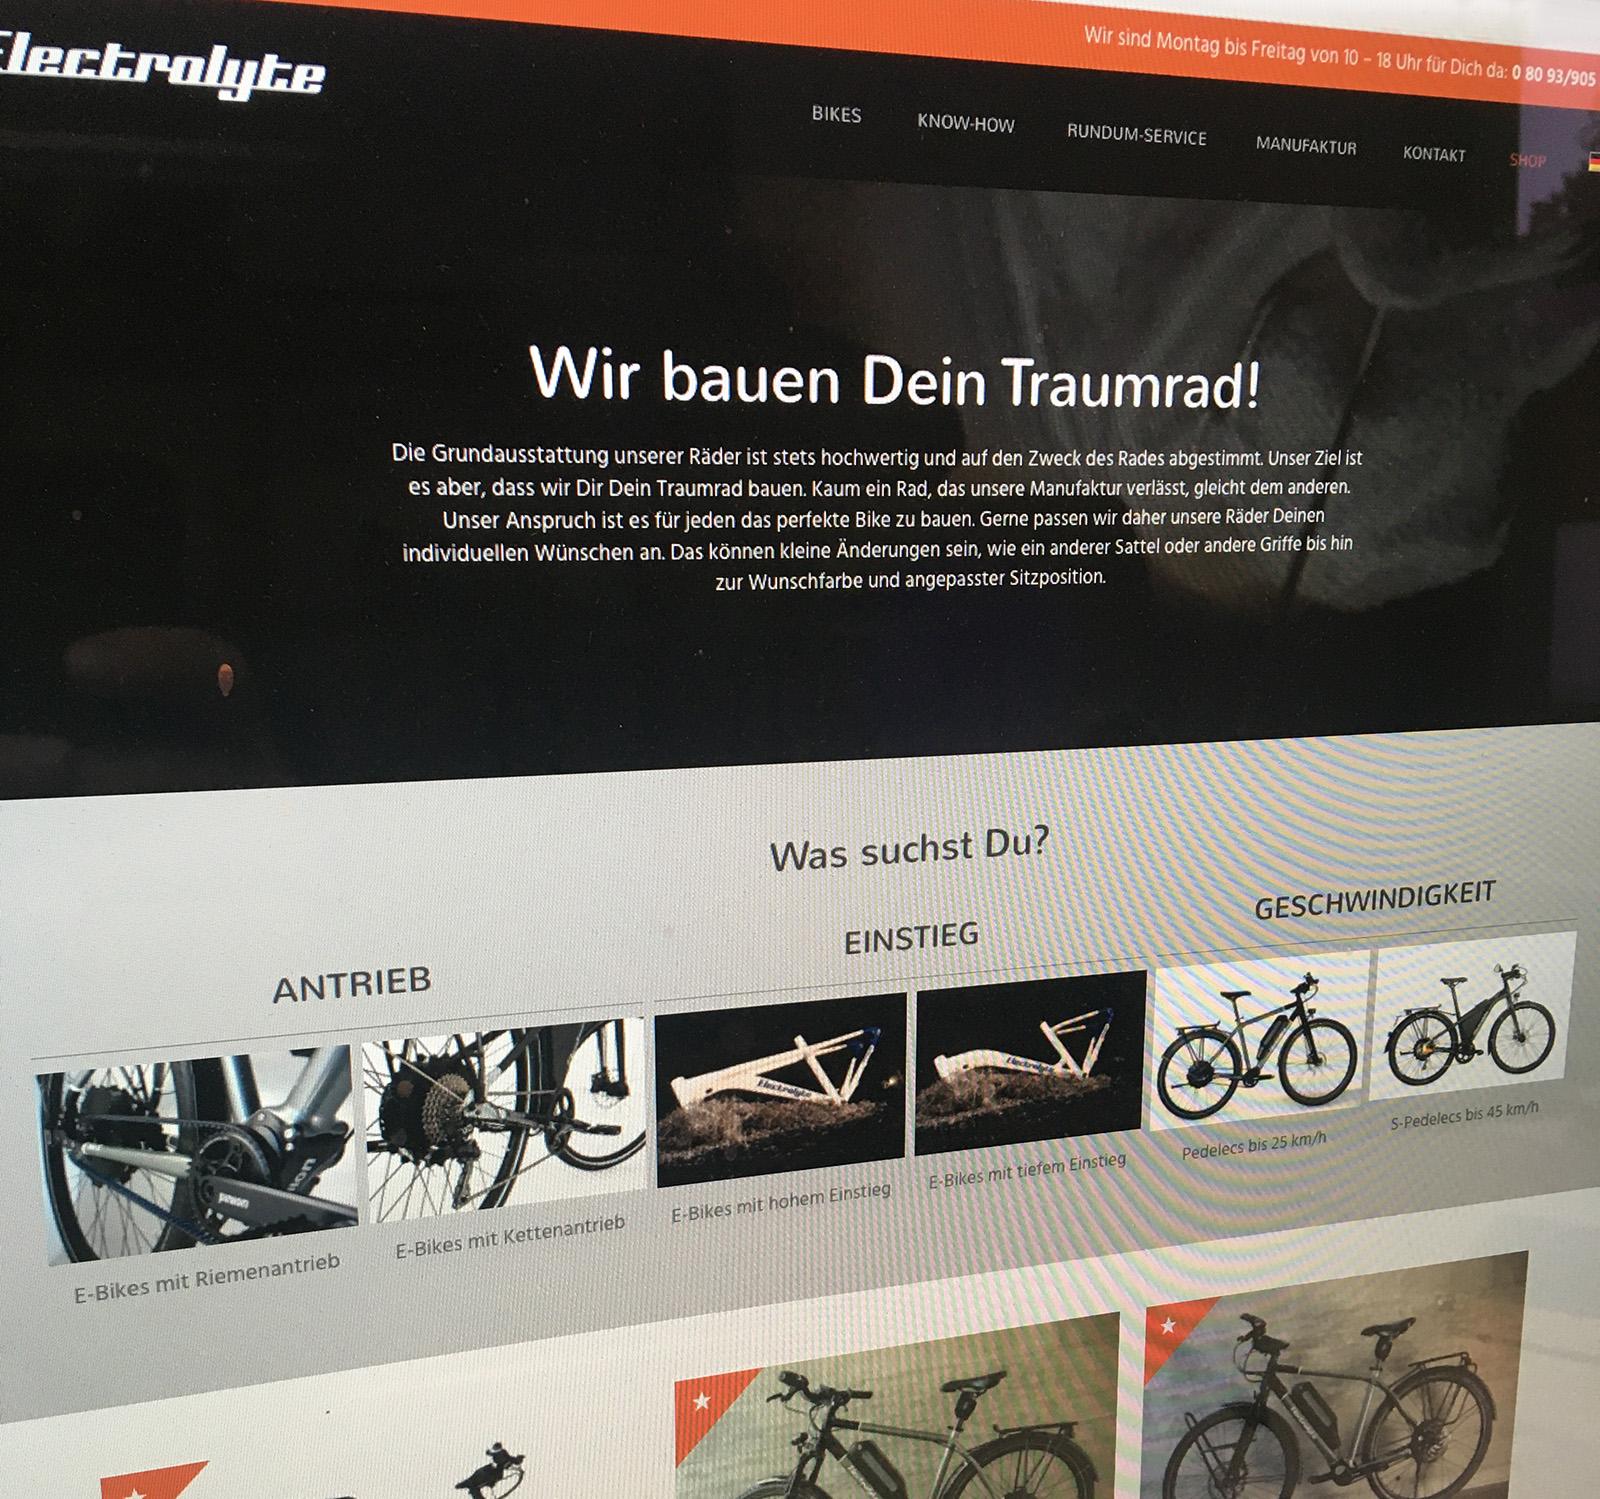 Electrolyte Online-Shop